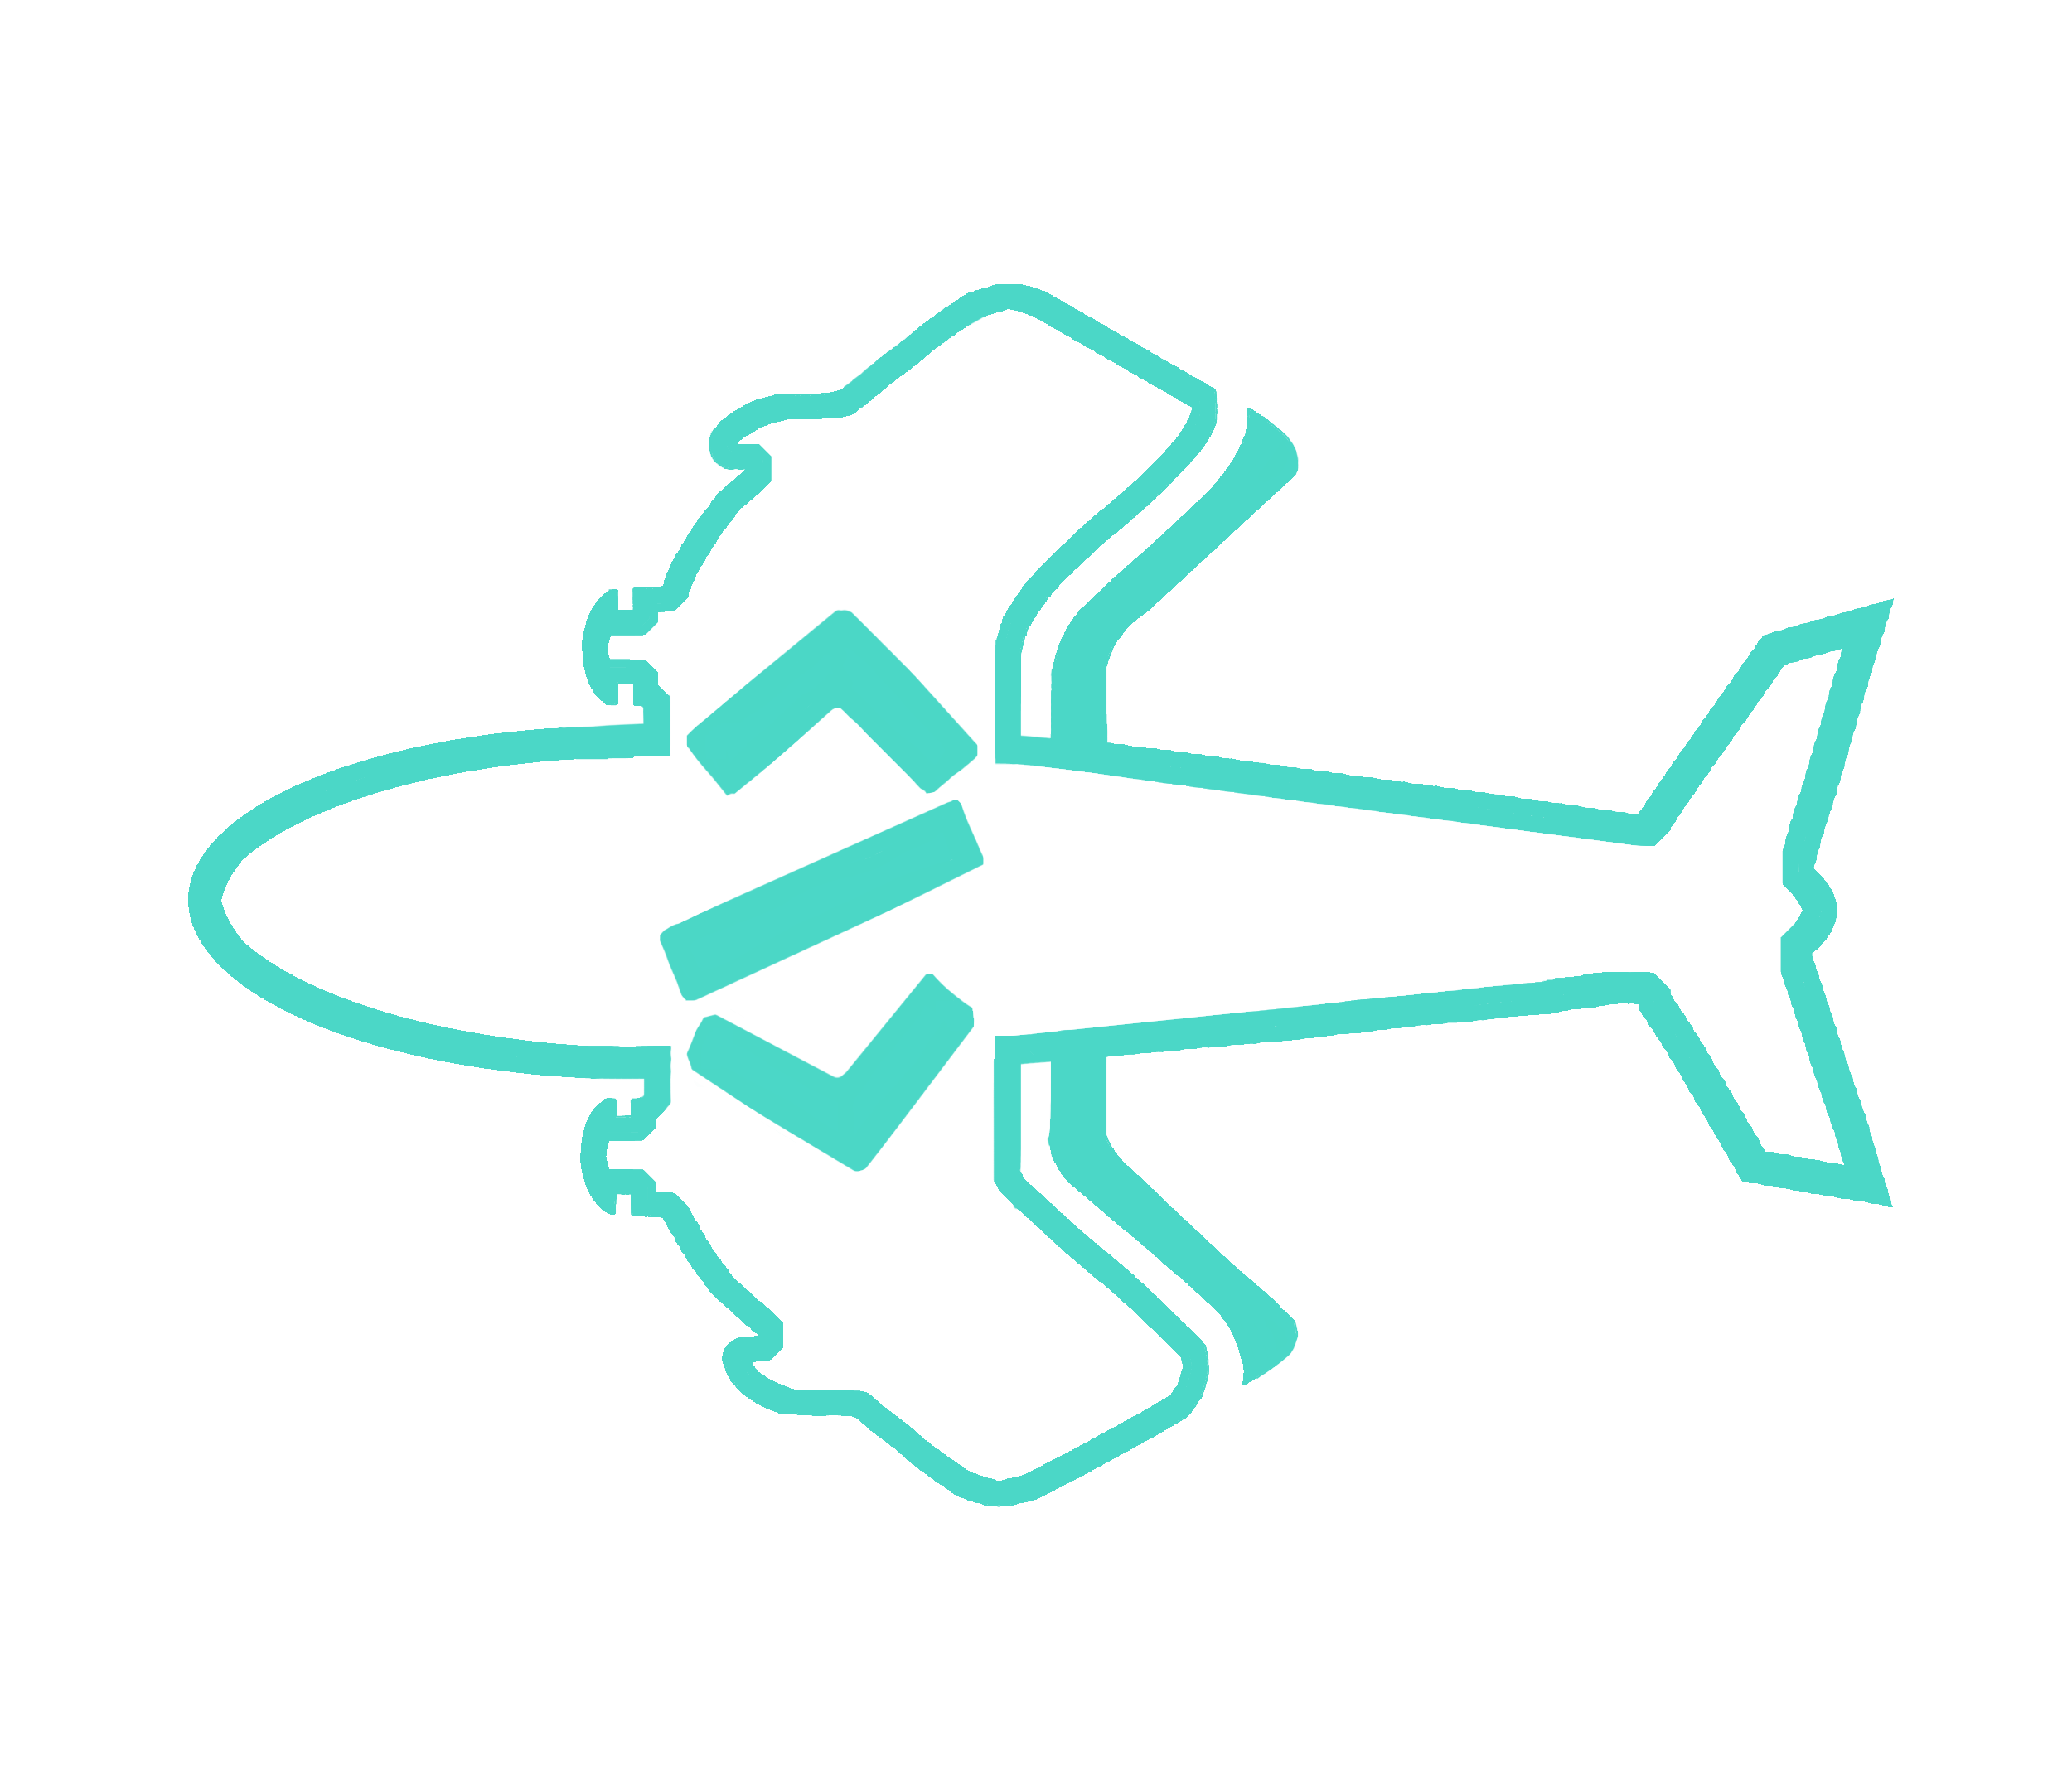 play_travel_code